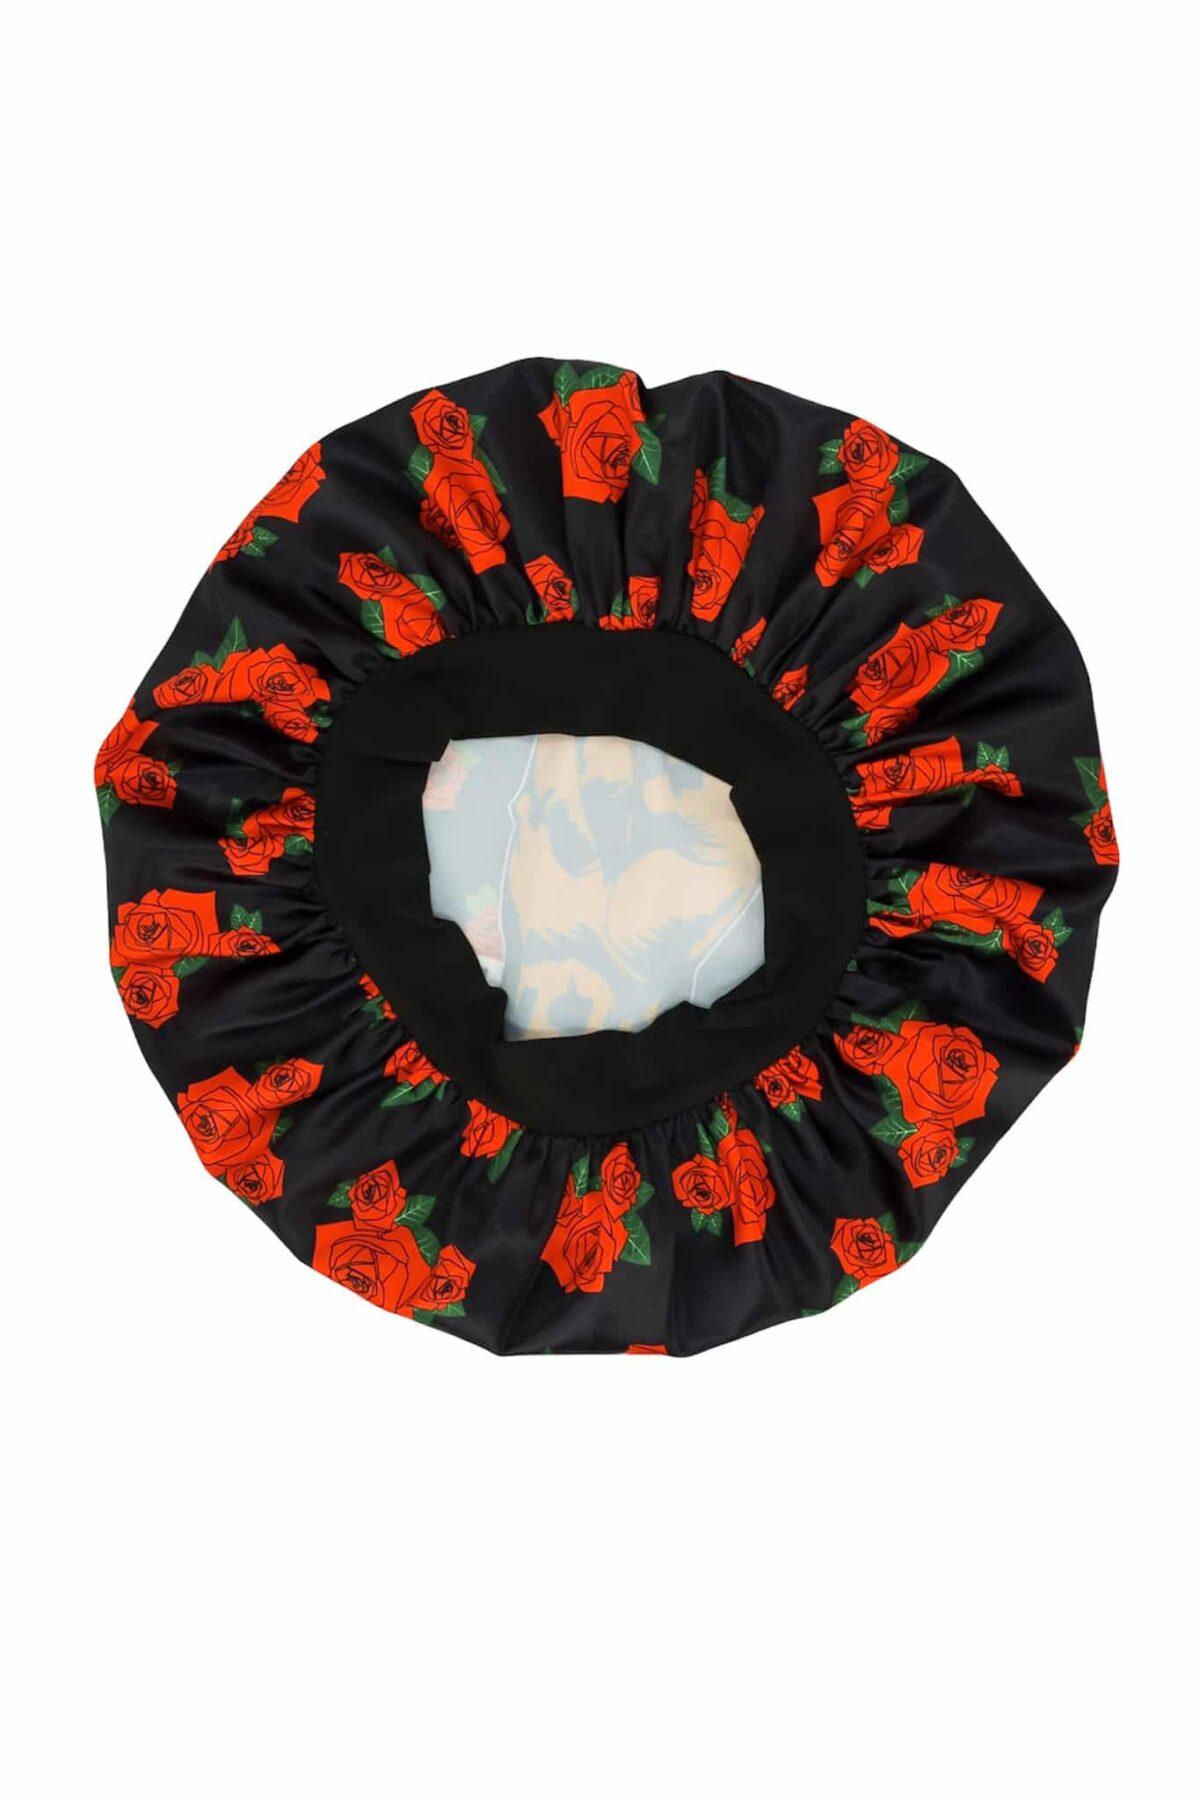 Black by Popular Demand® Rose Satin Bonnet HGC Apparel